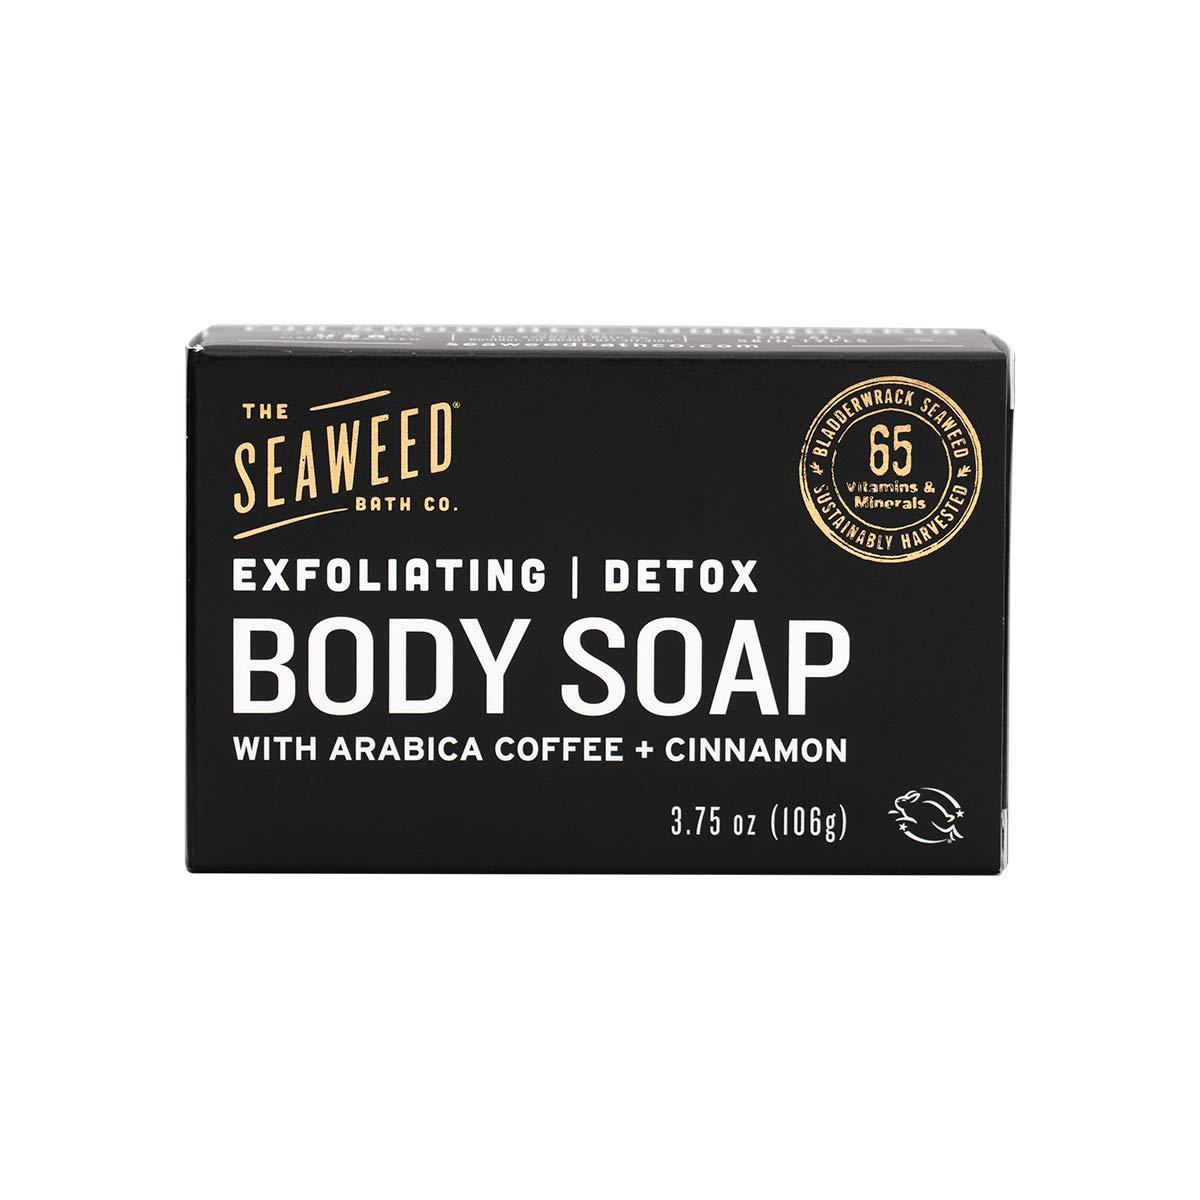 The Seaweed Bath Co. Exfoliating Detox Body Soap